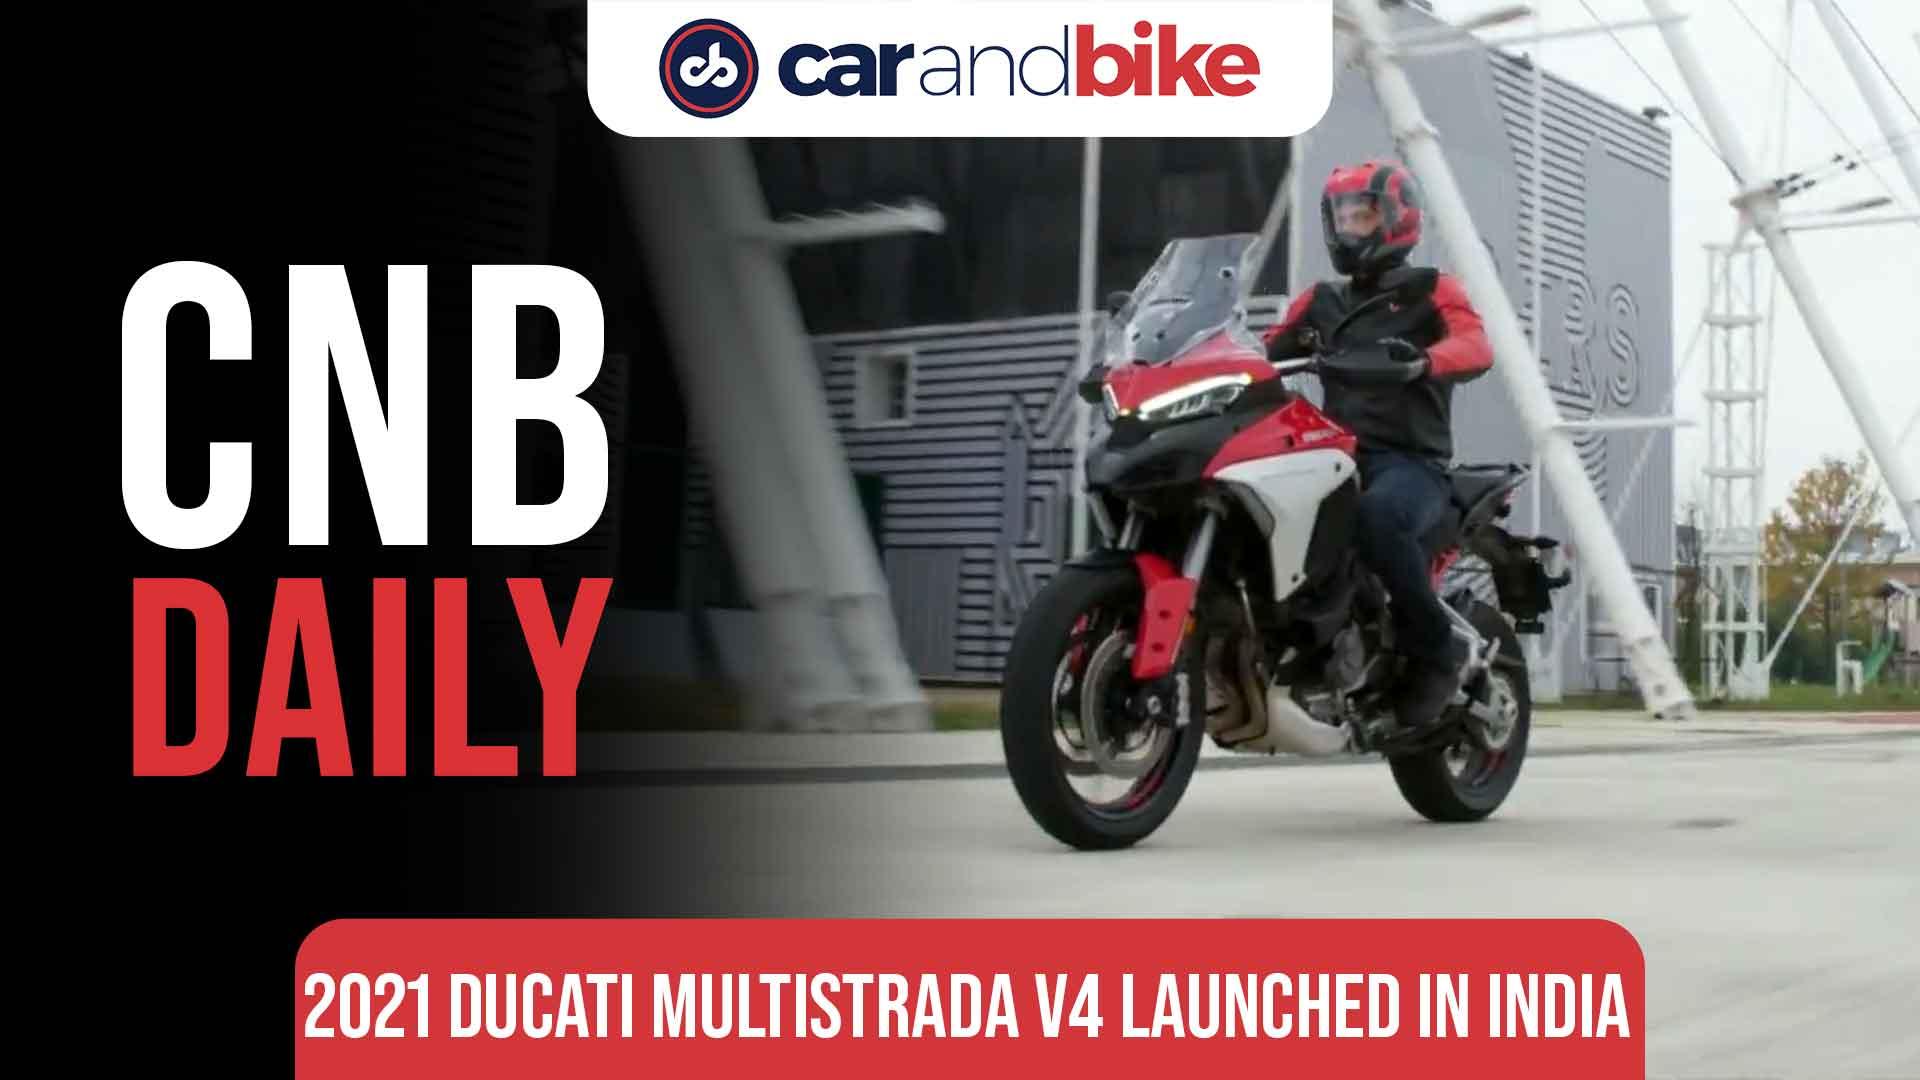 2021 Ducati Multistrada V4 launched in India